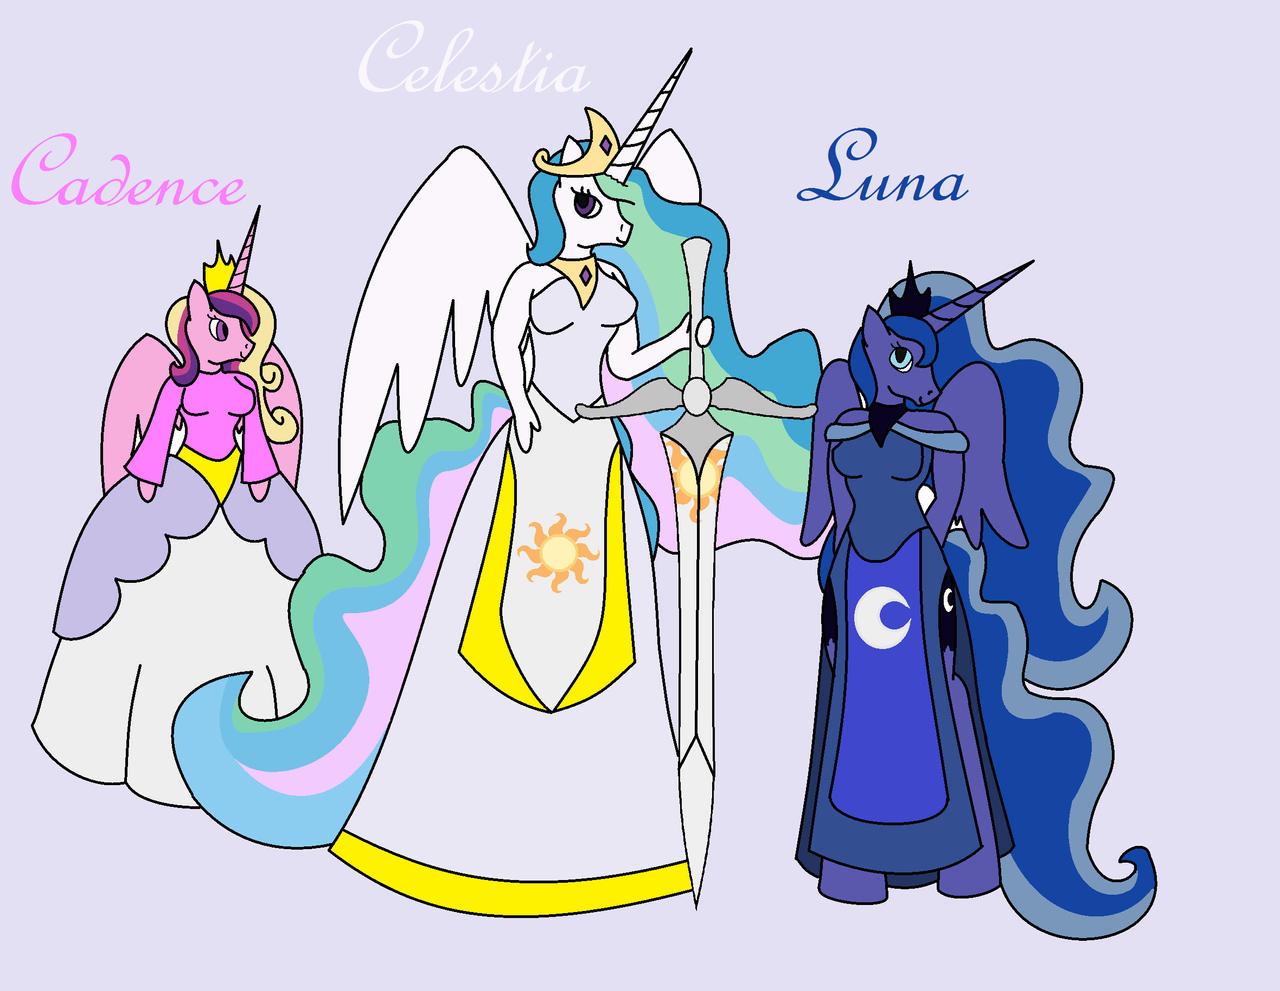 Is princess cadence related to celestia